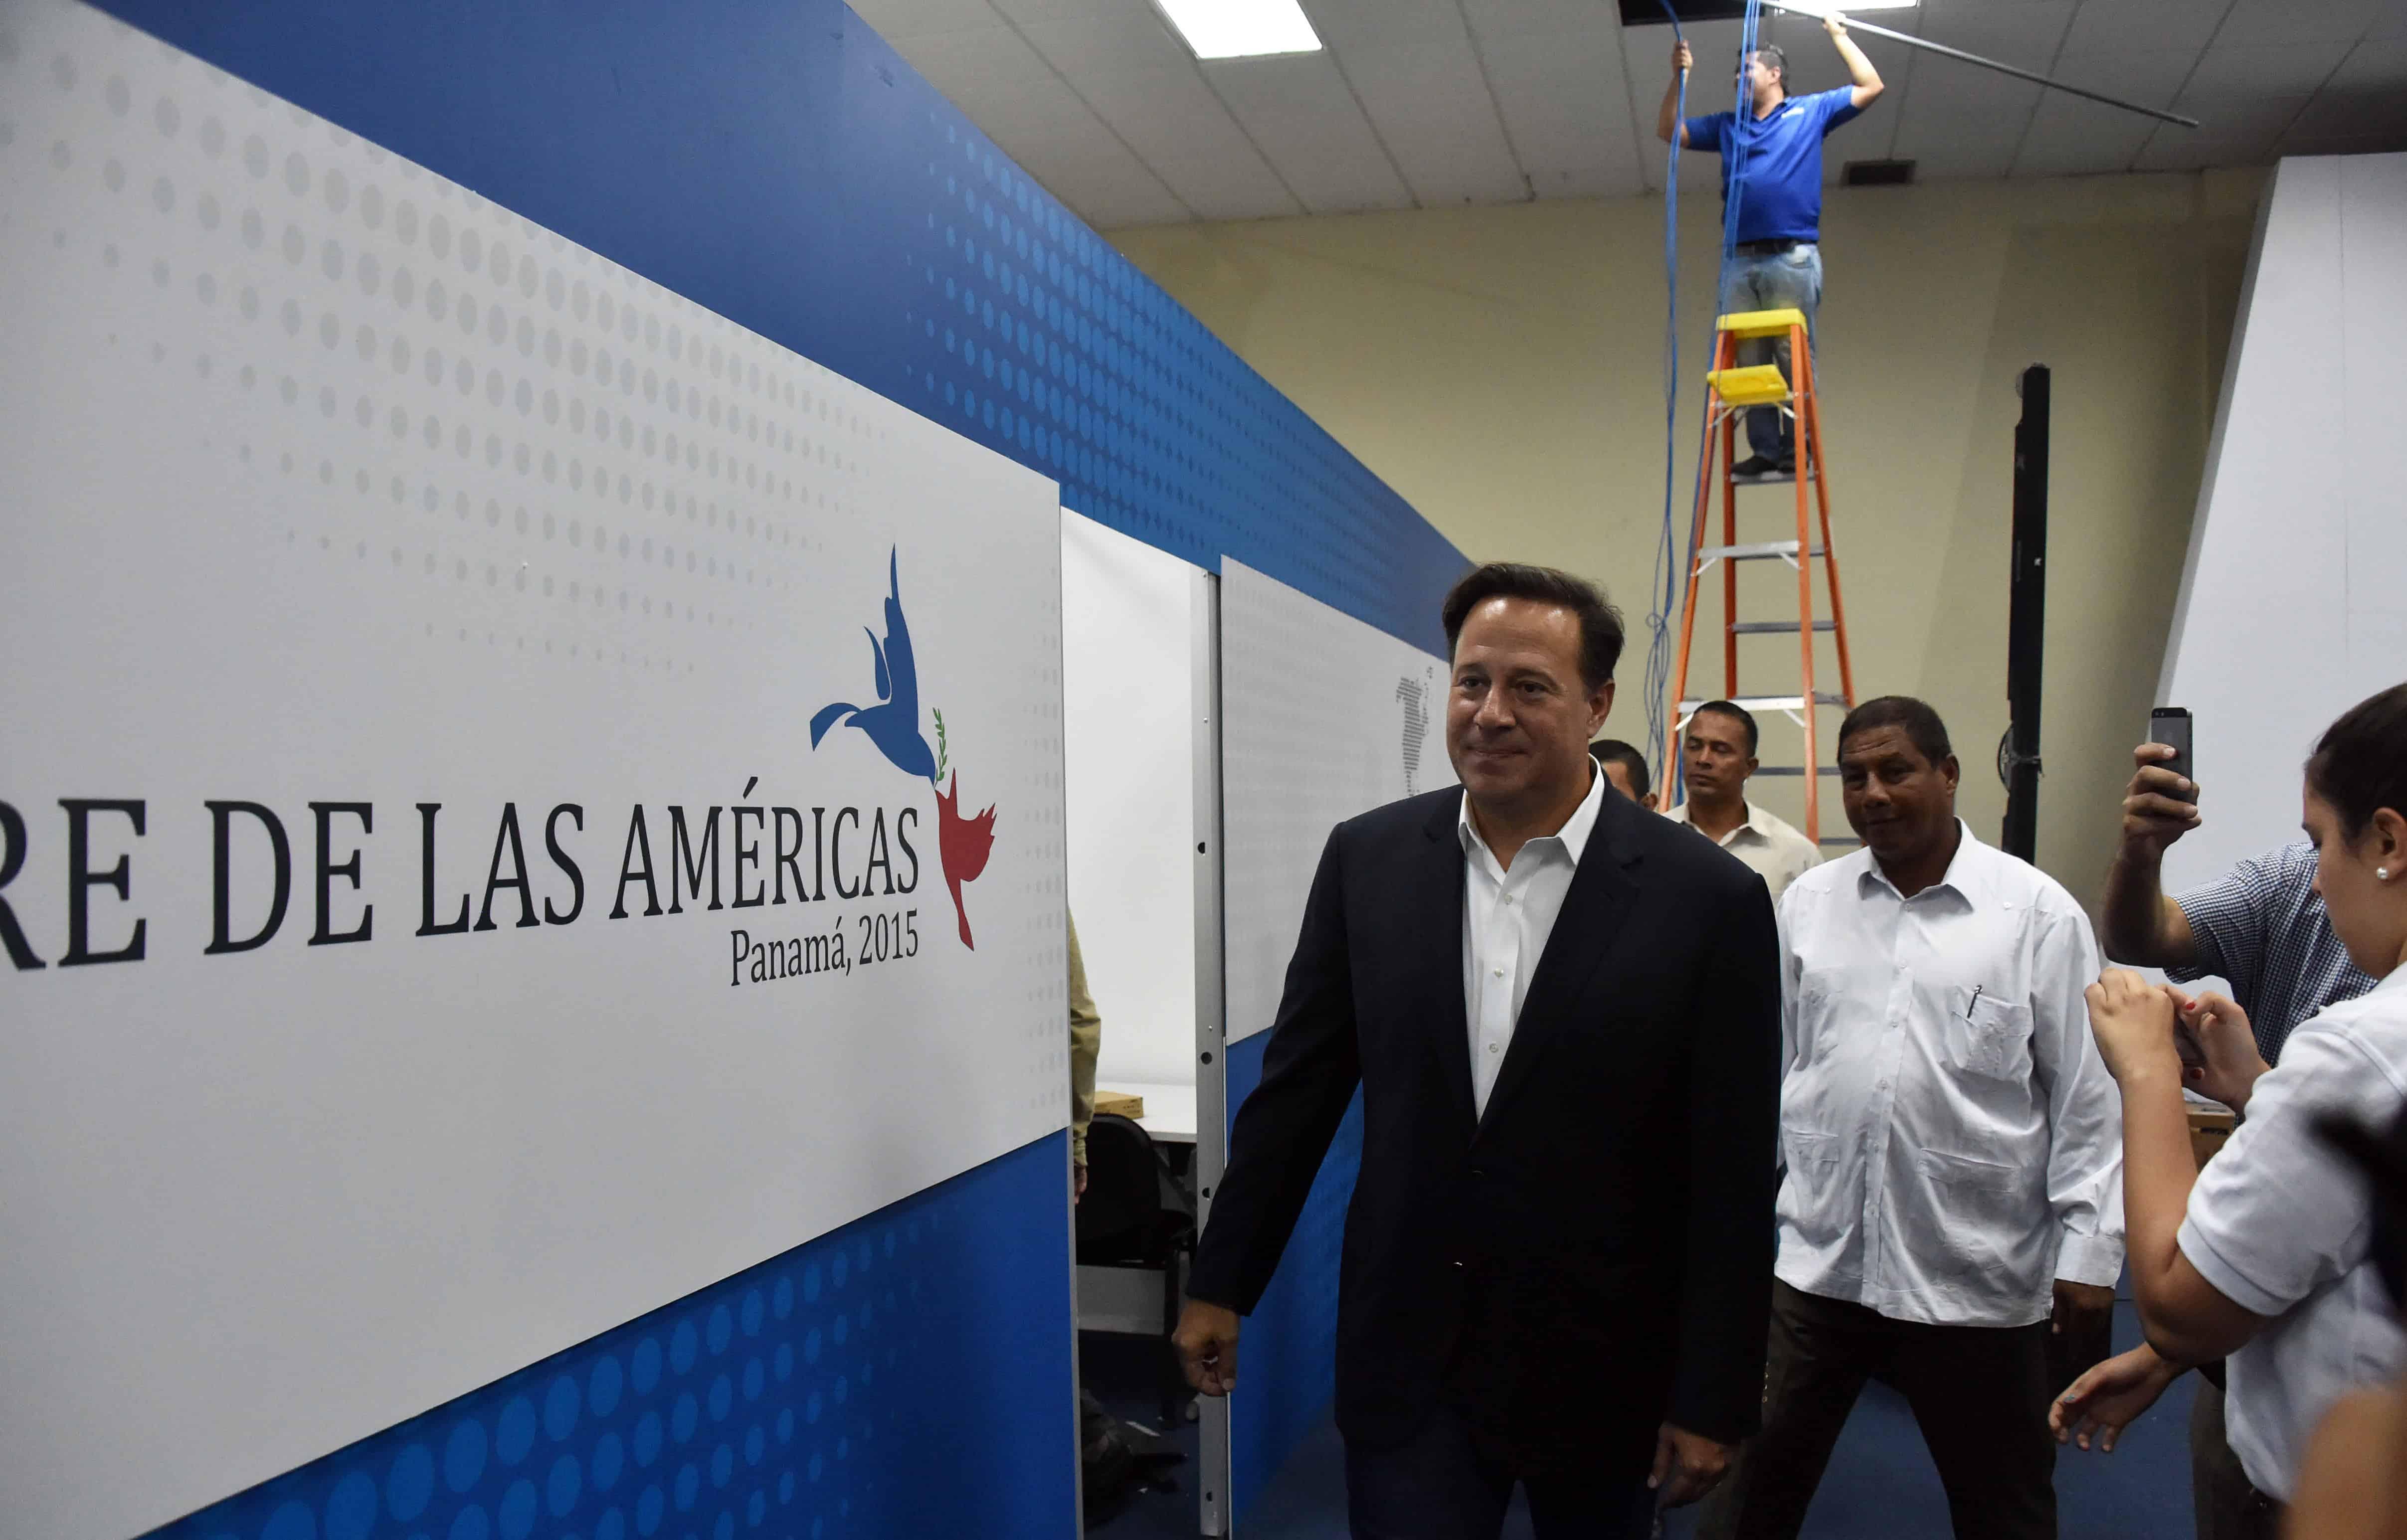 Panamanian President Juan Carlos Varela visits the Atlapa Convention Center.